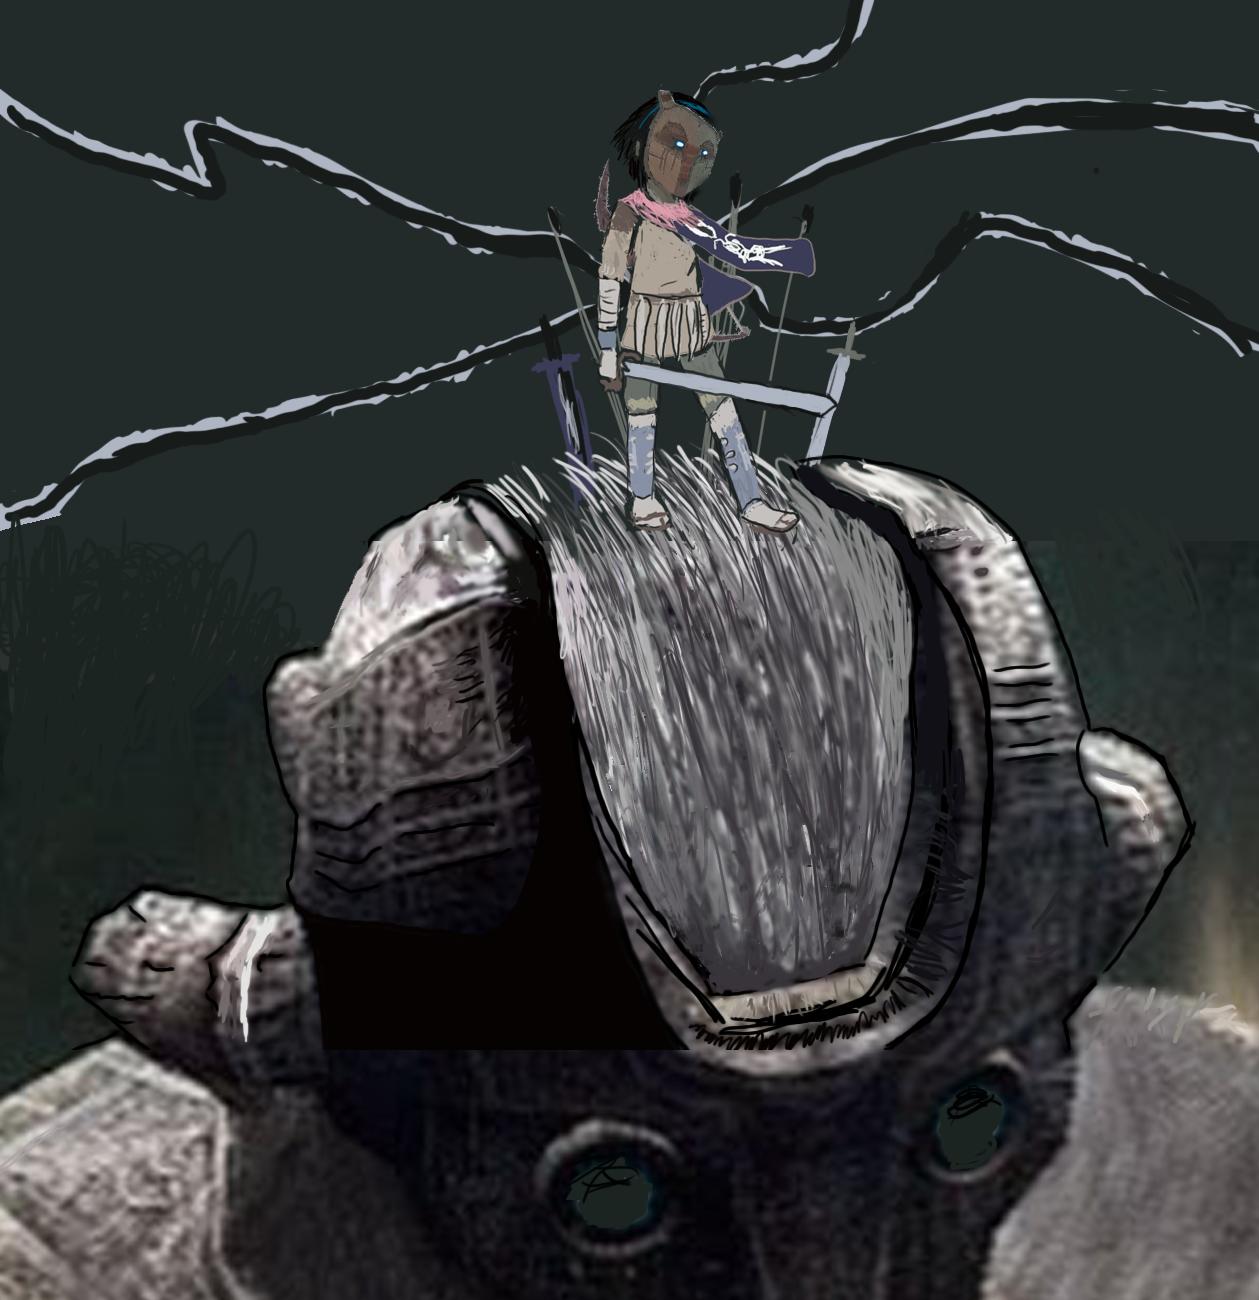 A Wandering Shaman's Destiny